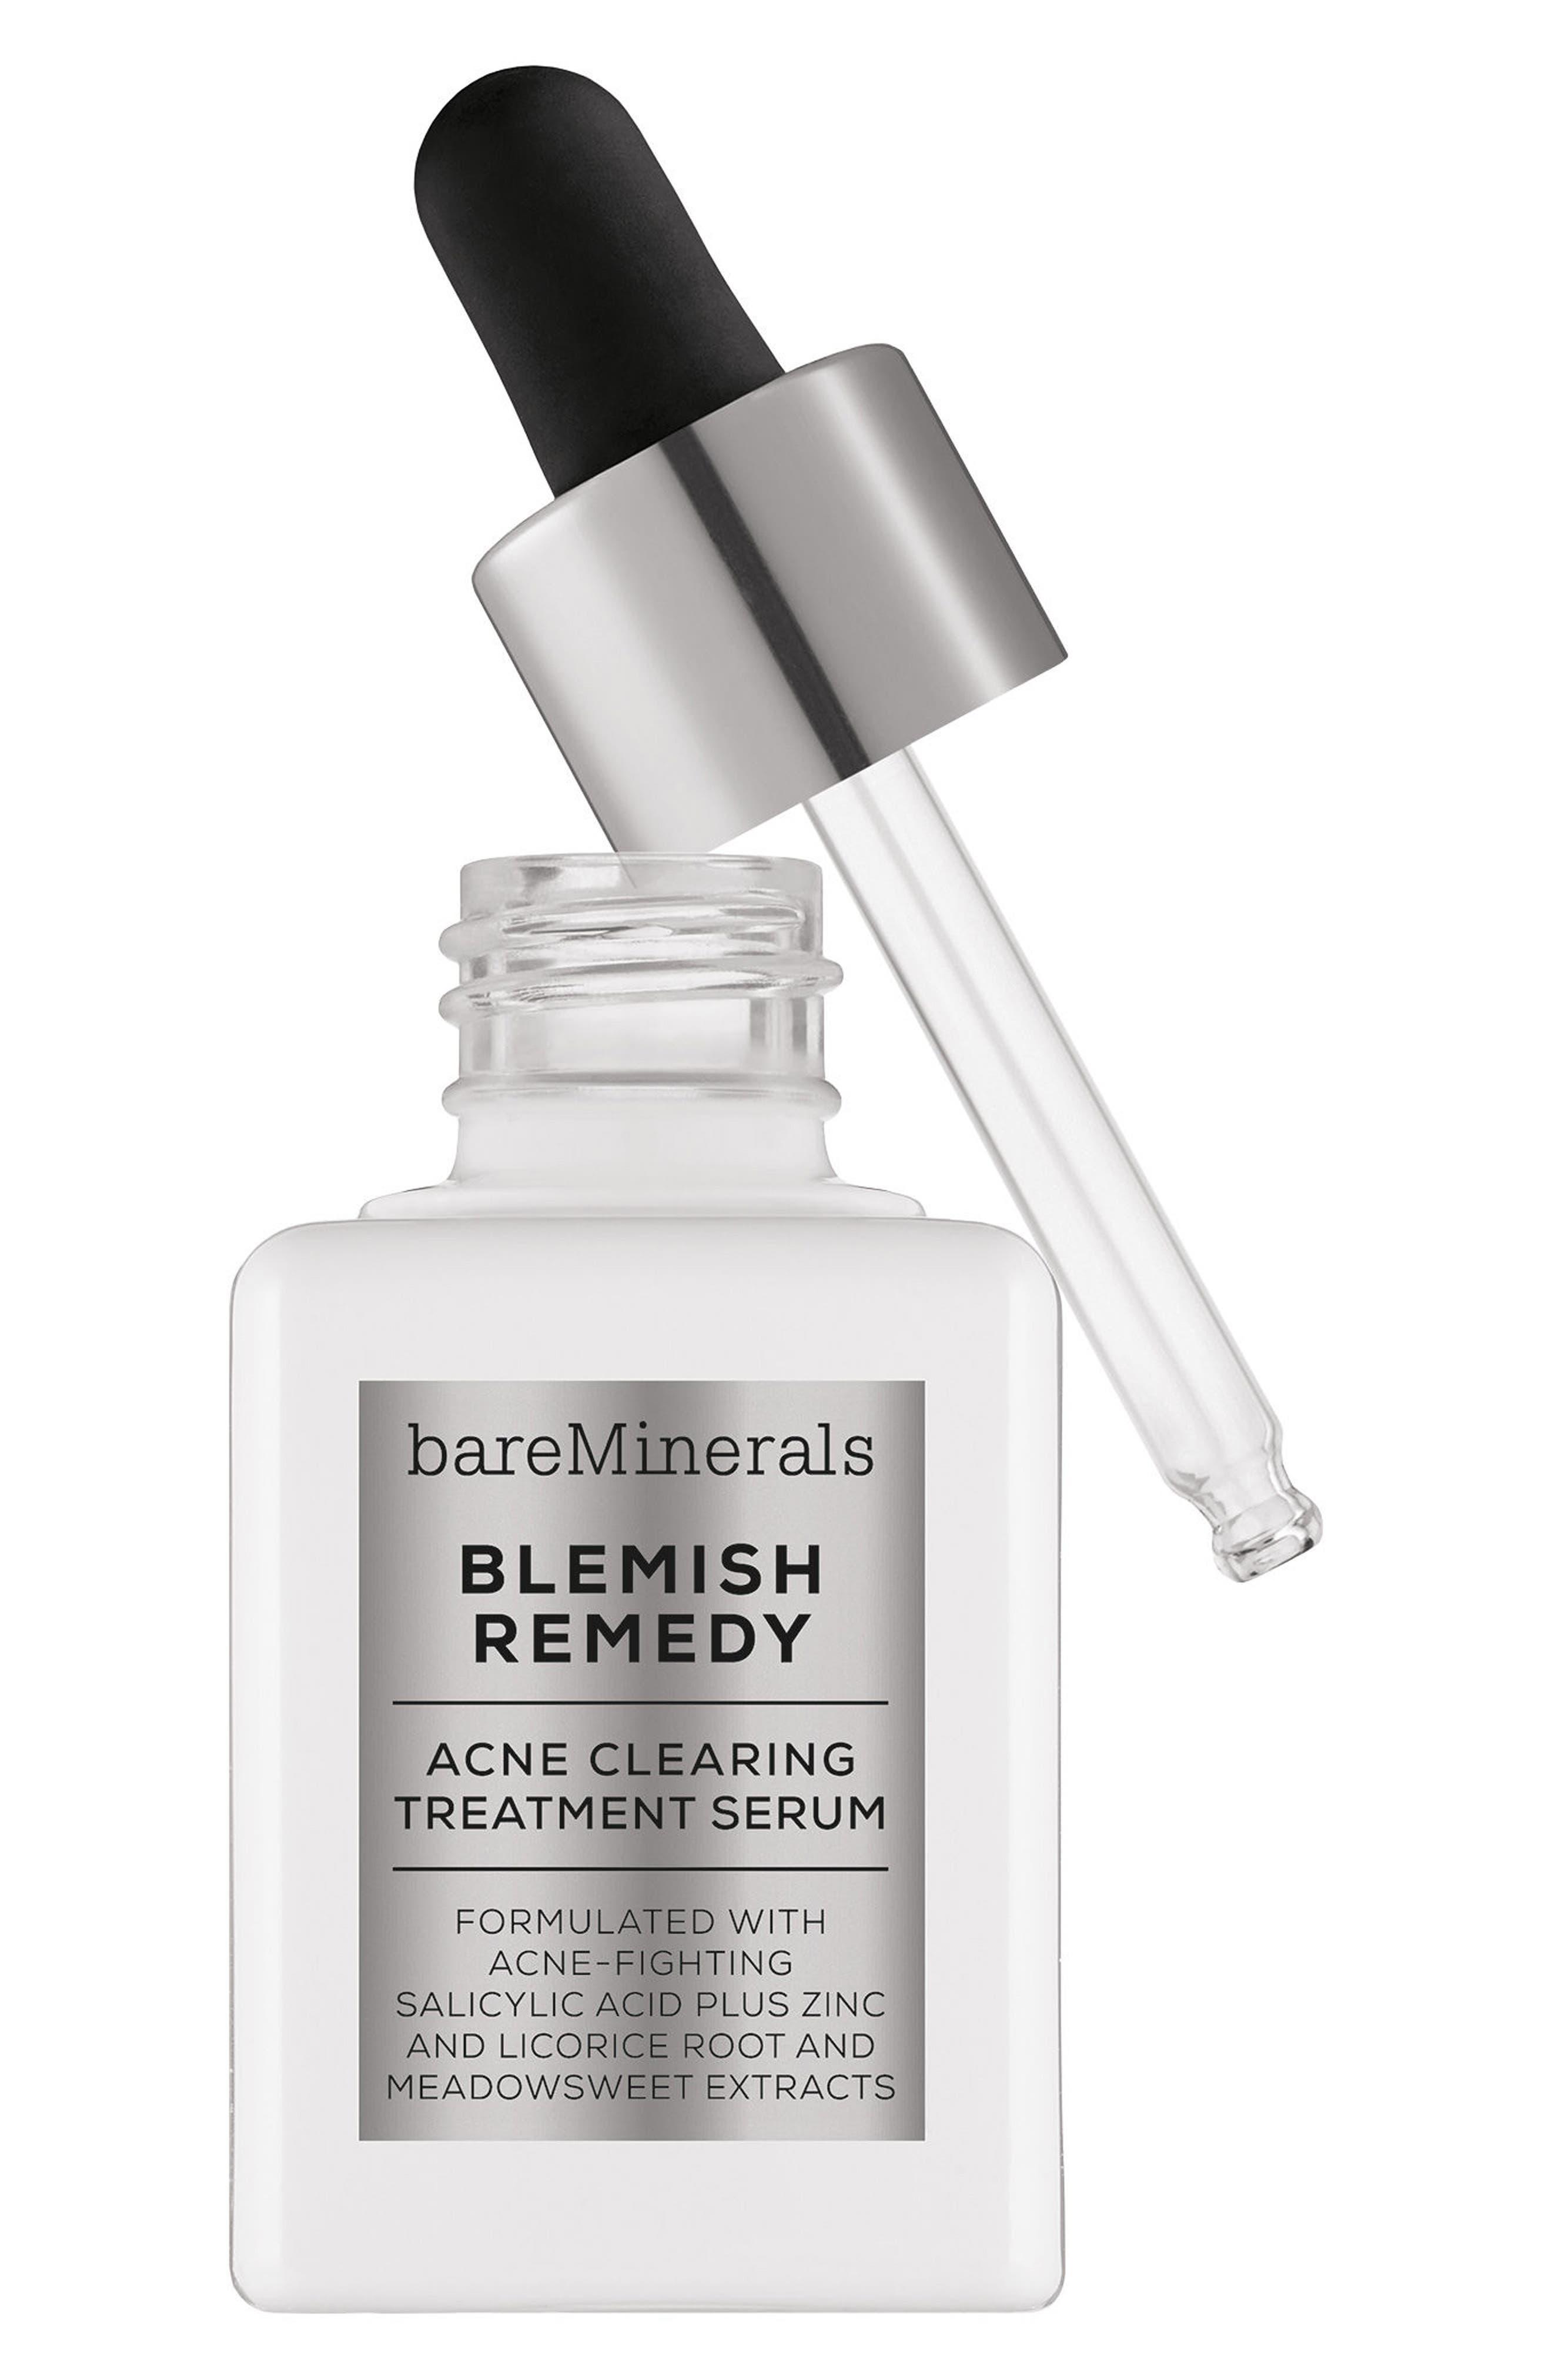 bareMinerals® Blemish Remedy® Acne Clearing Treatment Serum